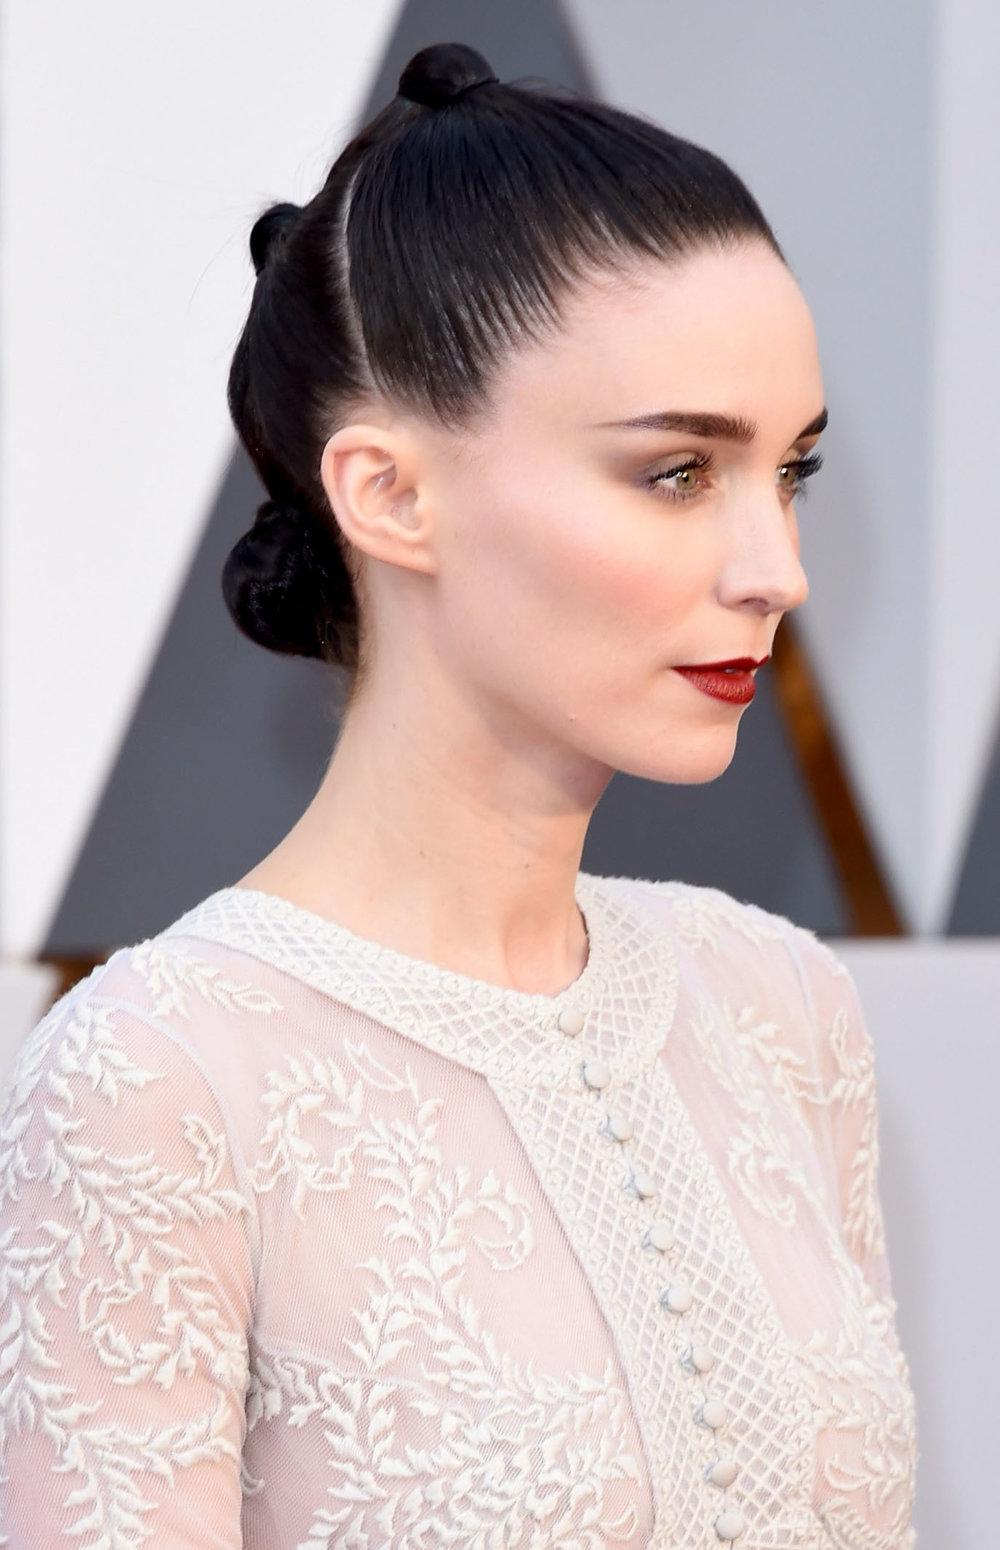 hair-dramatic-style-type-rooneymara-oscars-triple-bun-hair.jpg